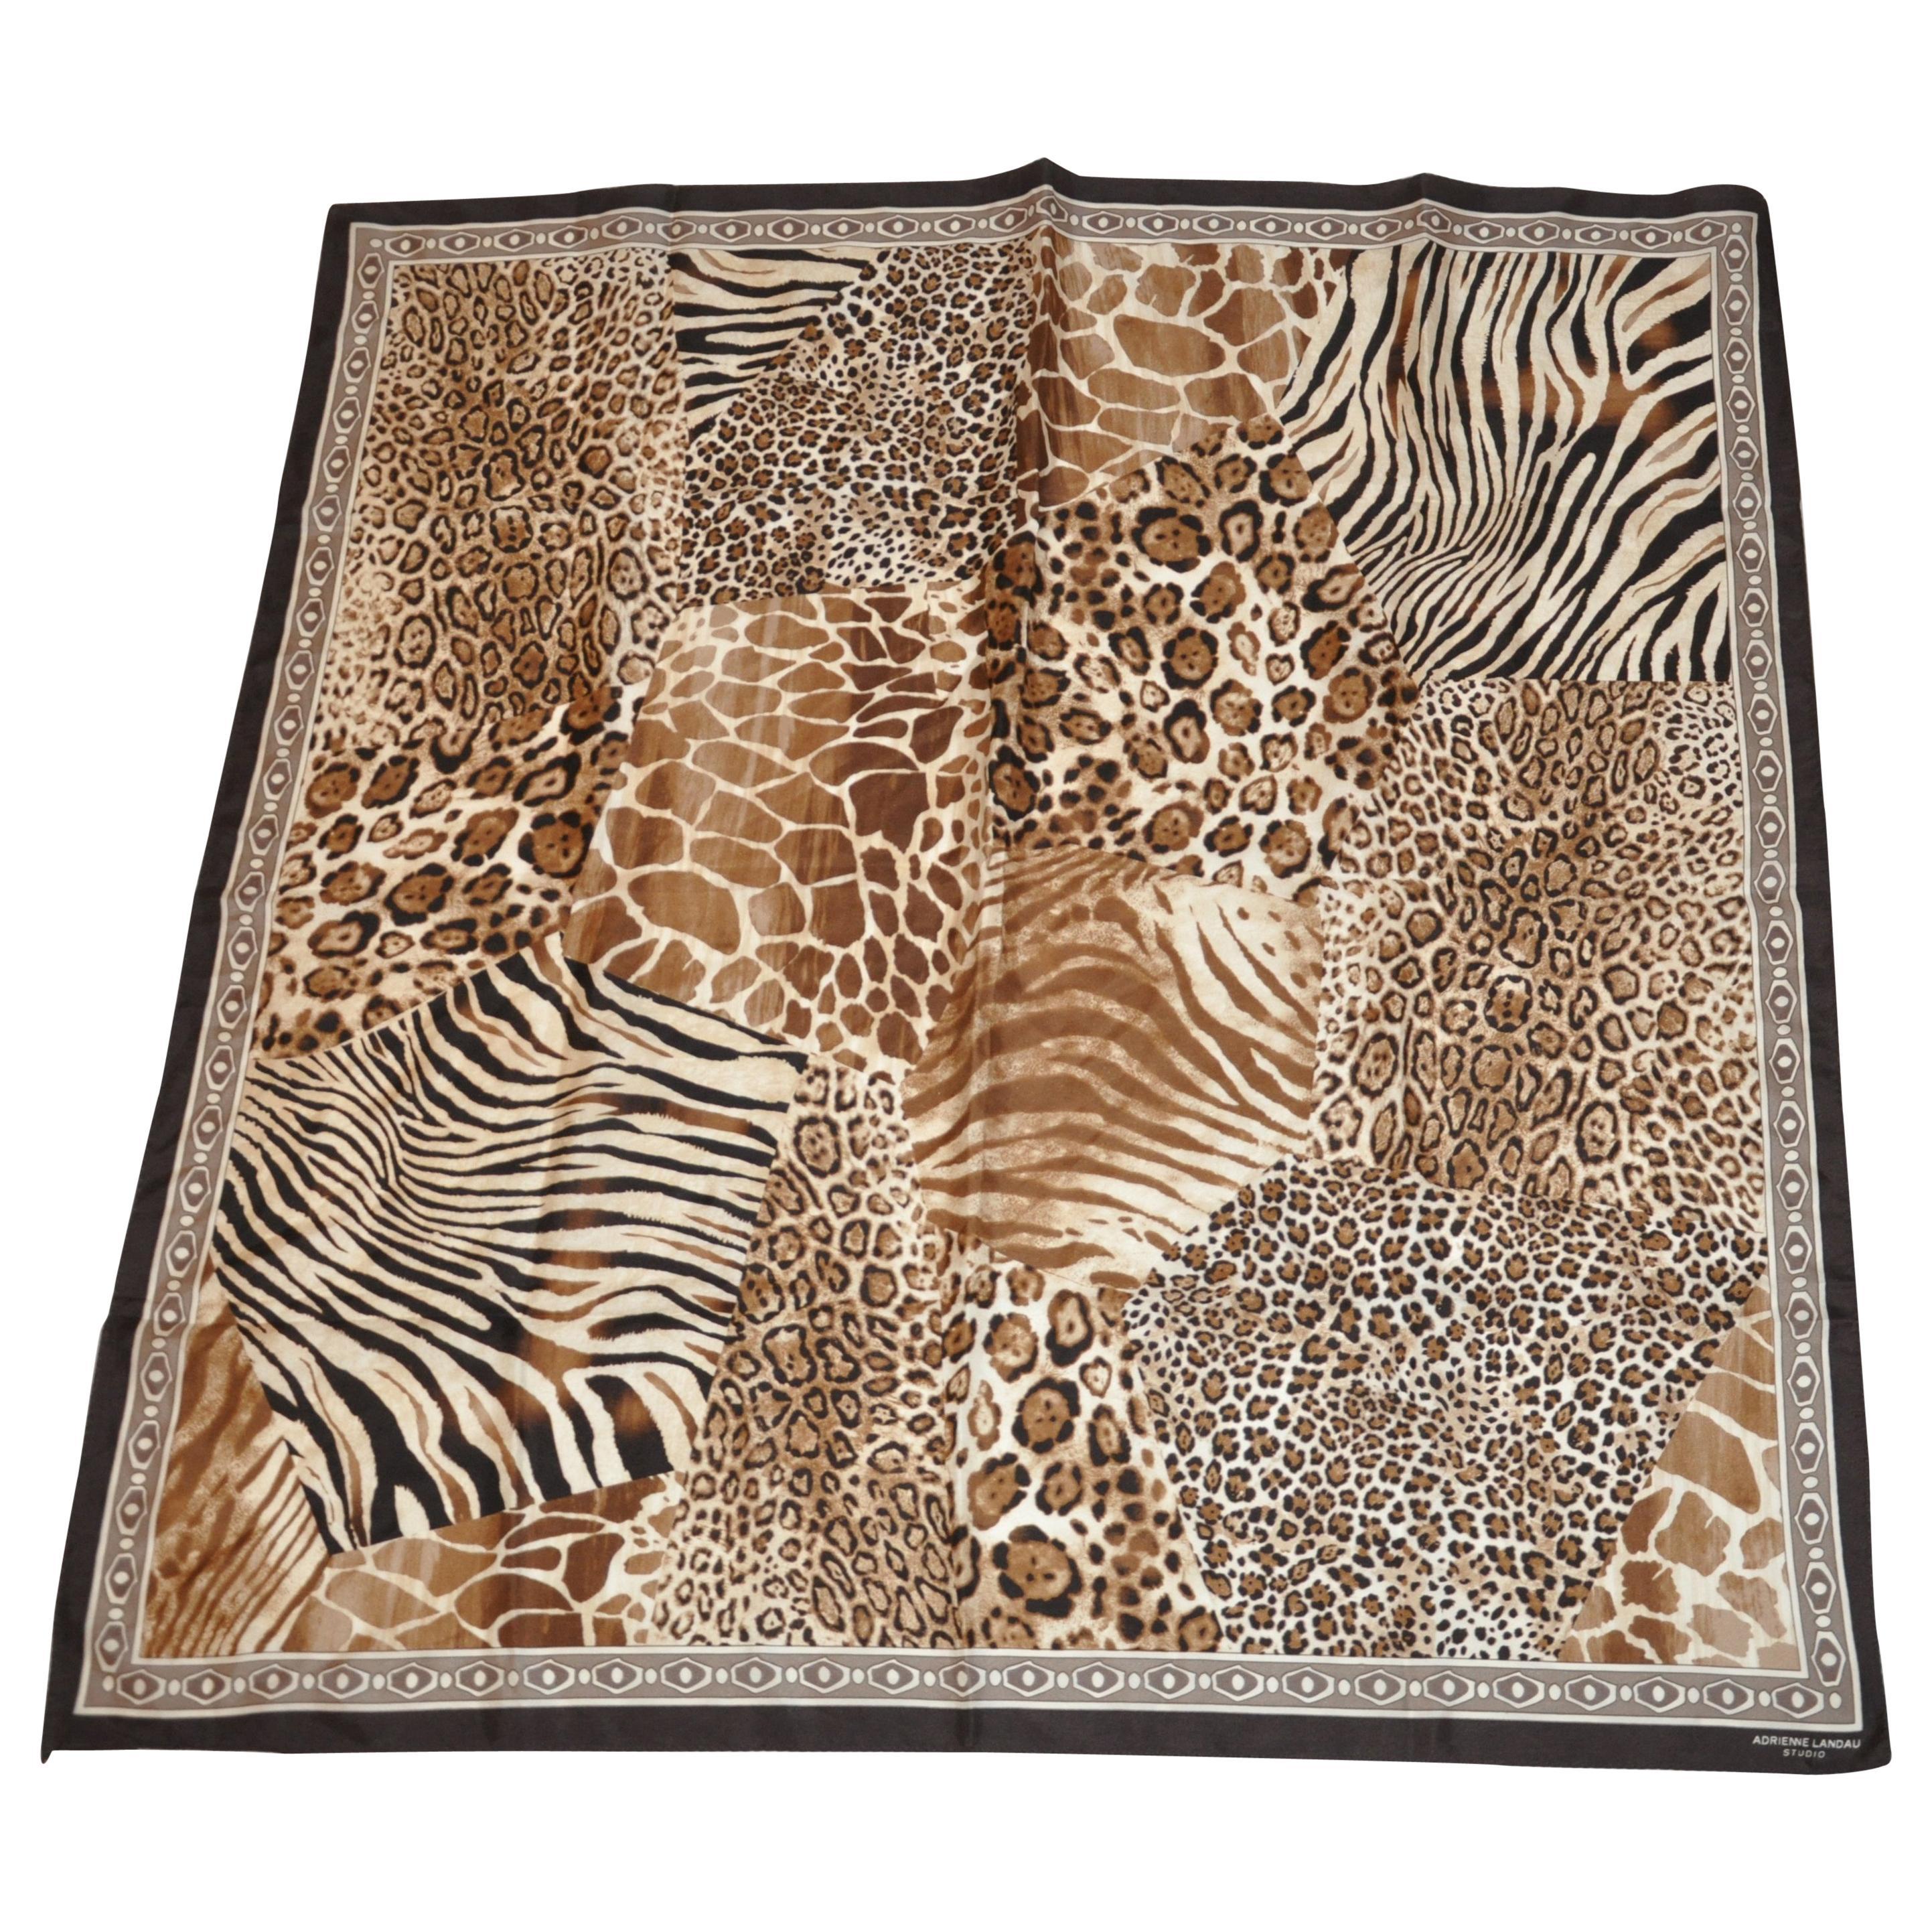 "Adrienne Landau Multi Shades of Browns & Cream ""Lions, Tigers and Leopard"" Scarf"